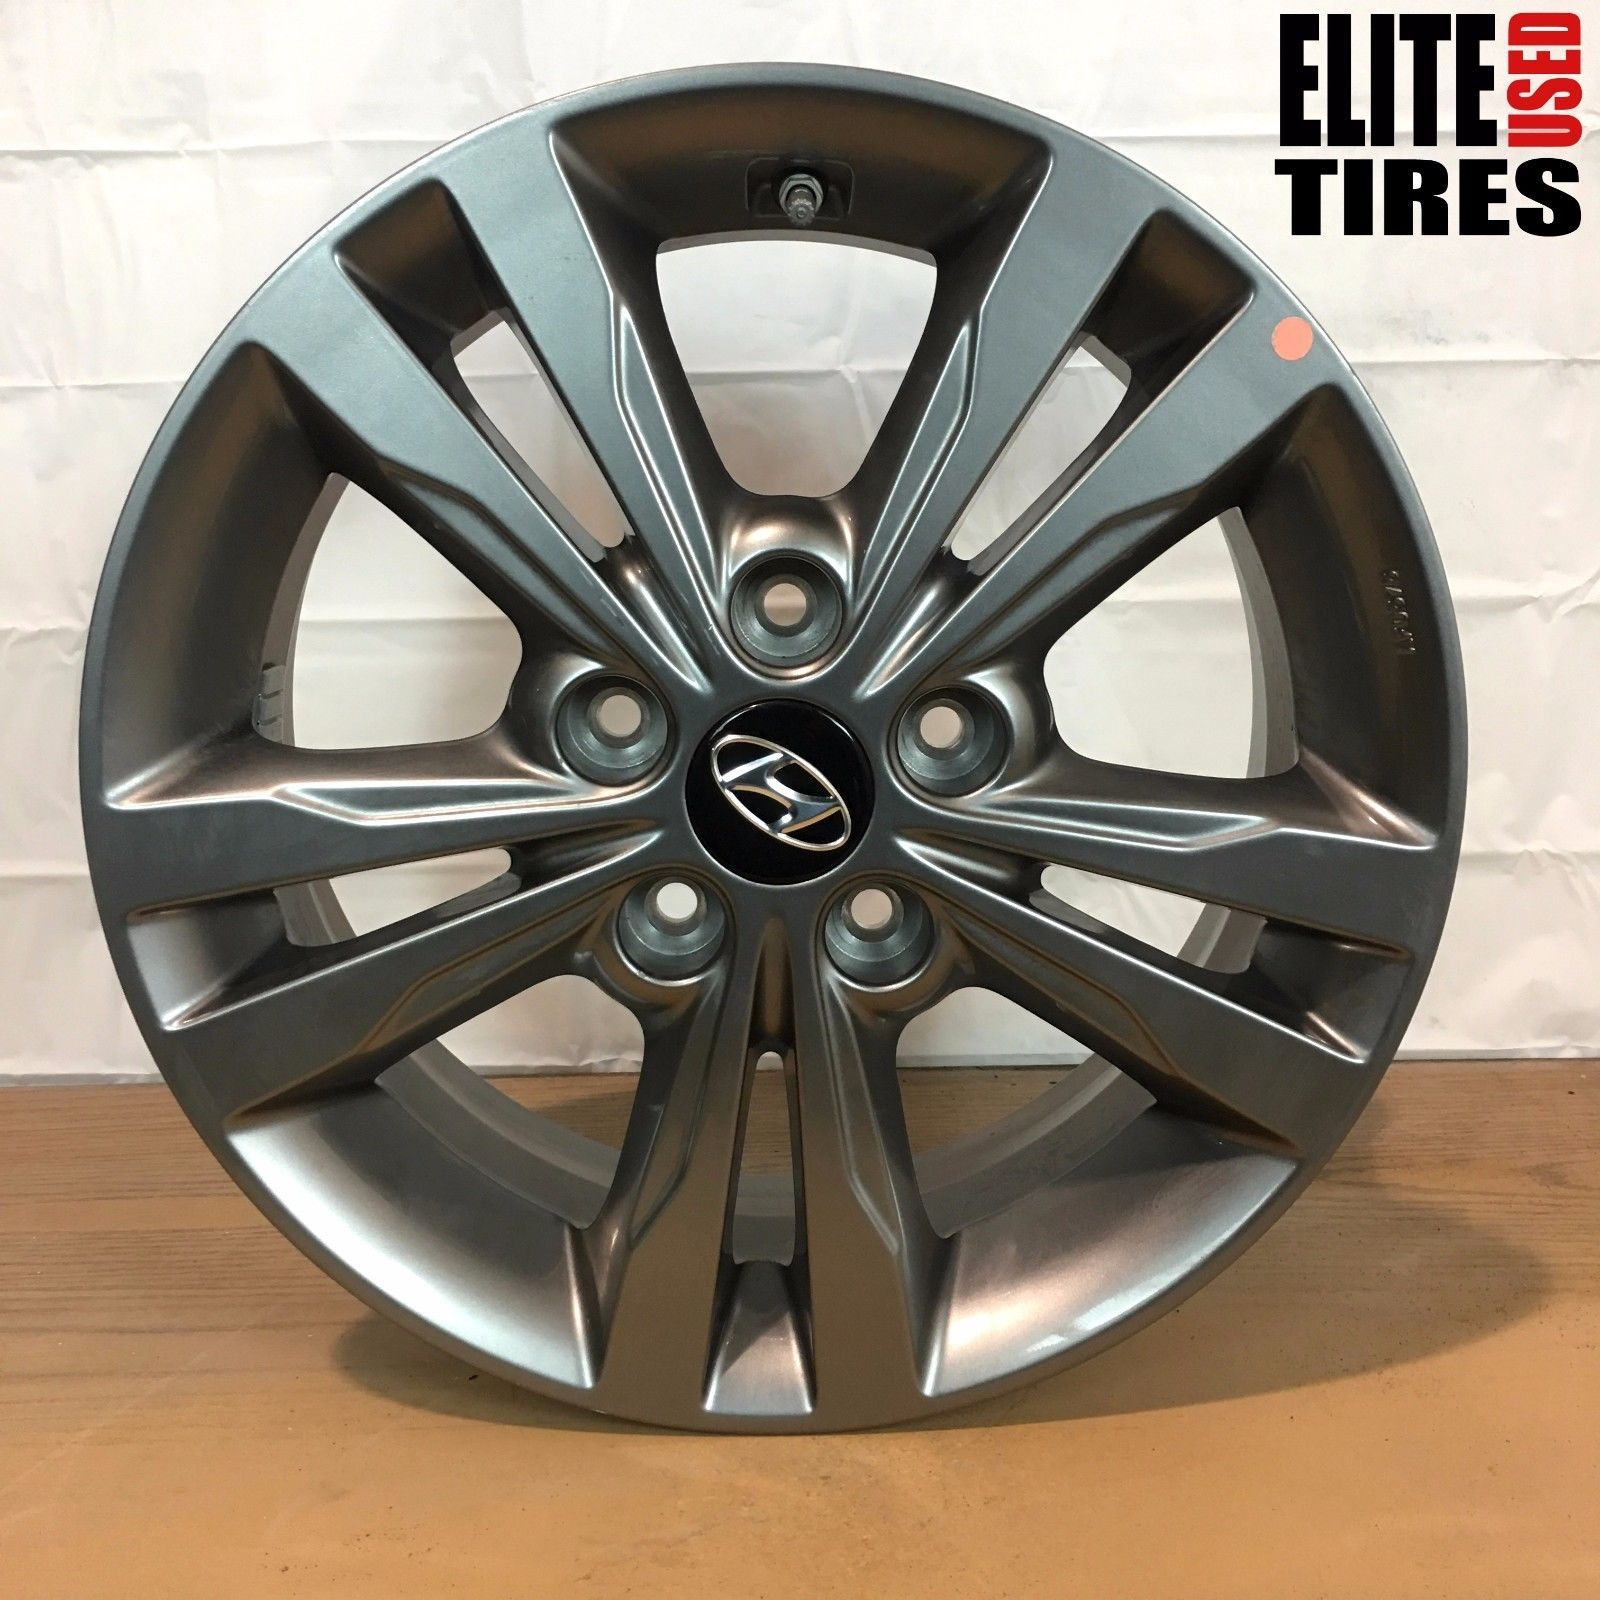 Hyundai Elantra 2016 2017 Factory Oem Grey Alloy Aluminum Wheel Rim 16 X 6 5 Https T Co G4icwlvmyu Https T Co G4icwlvm Elantra Wheel Rims Hyundai Elantra